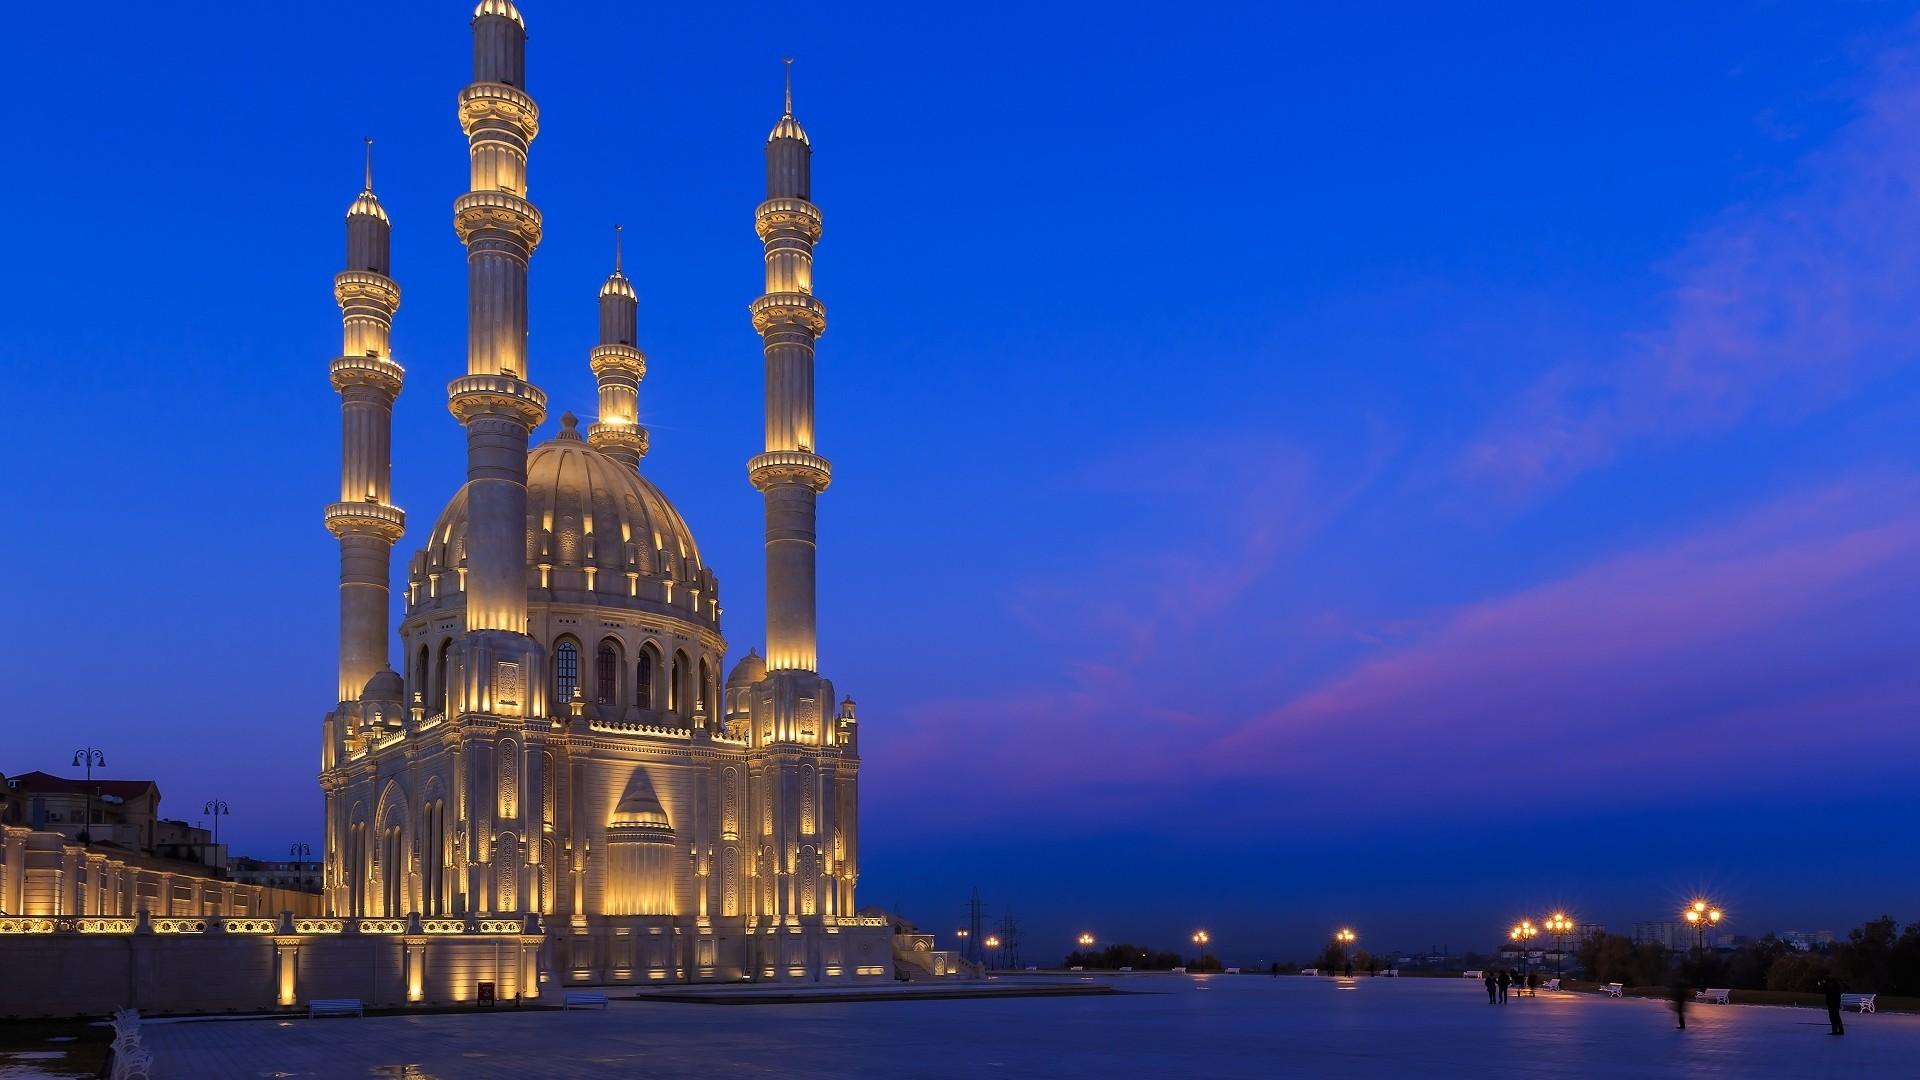 Download 1920x1080 Heydar Mosque Azerbaijan Baku Lights Night 1920x1080